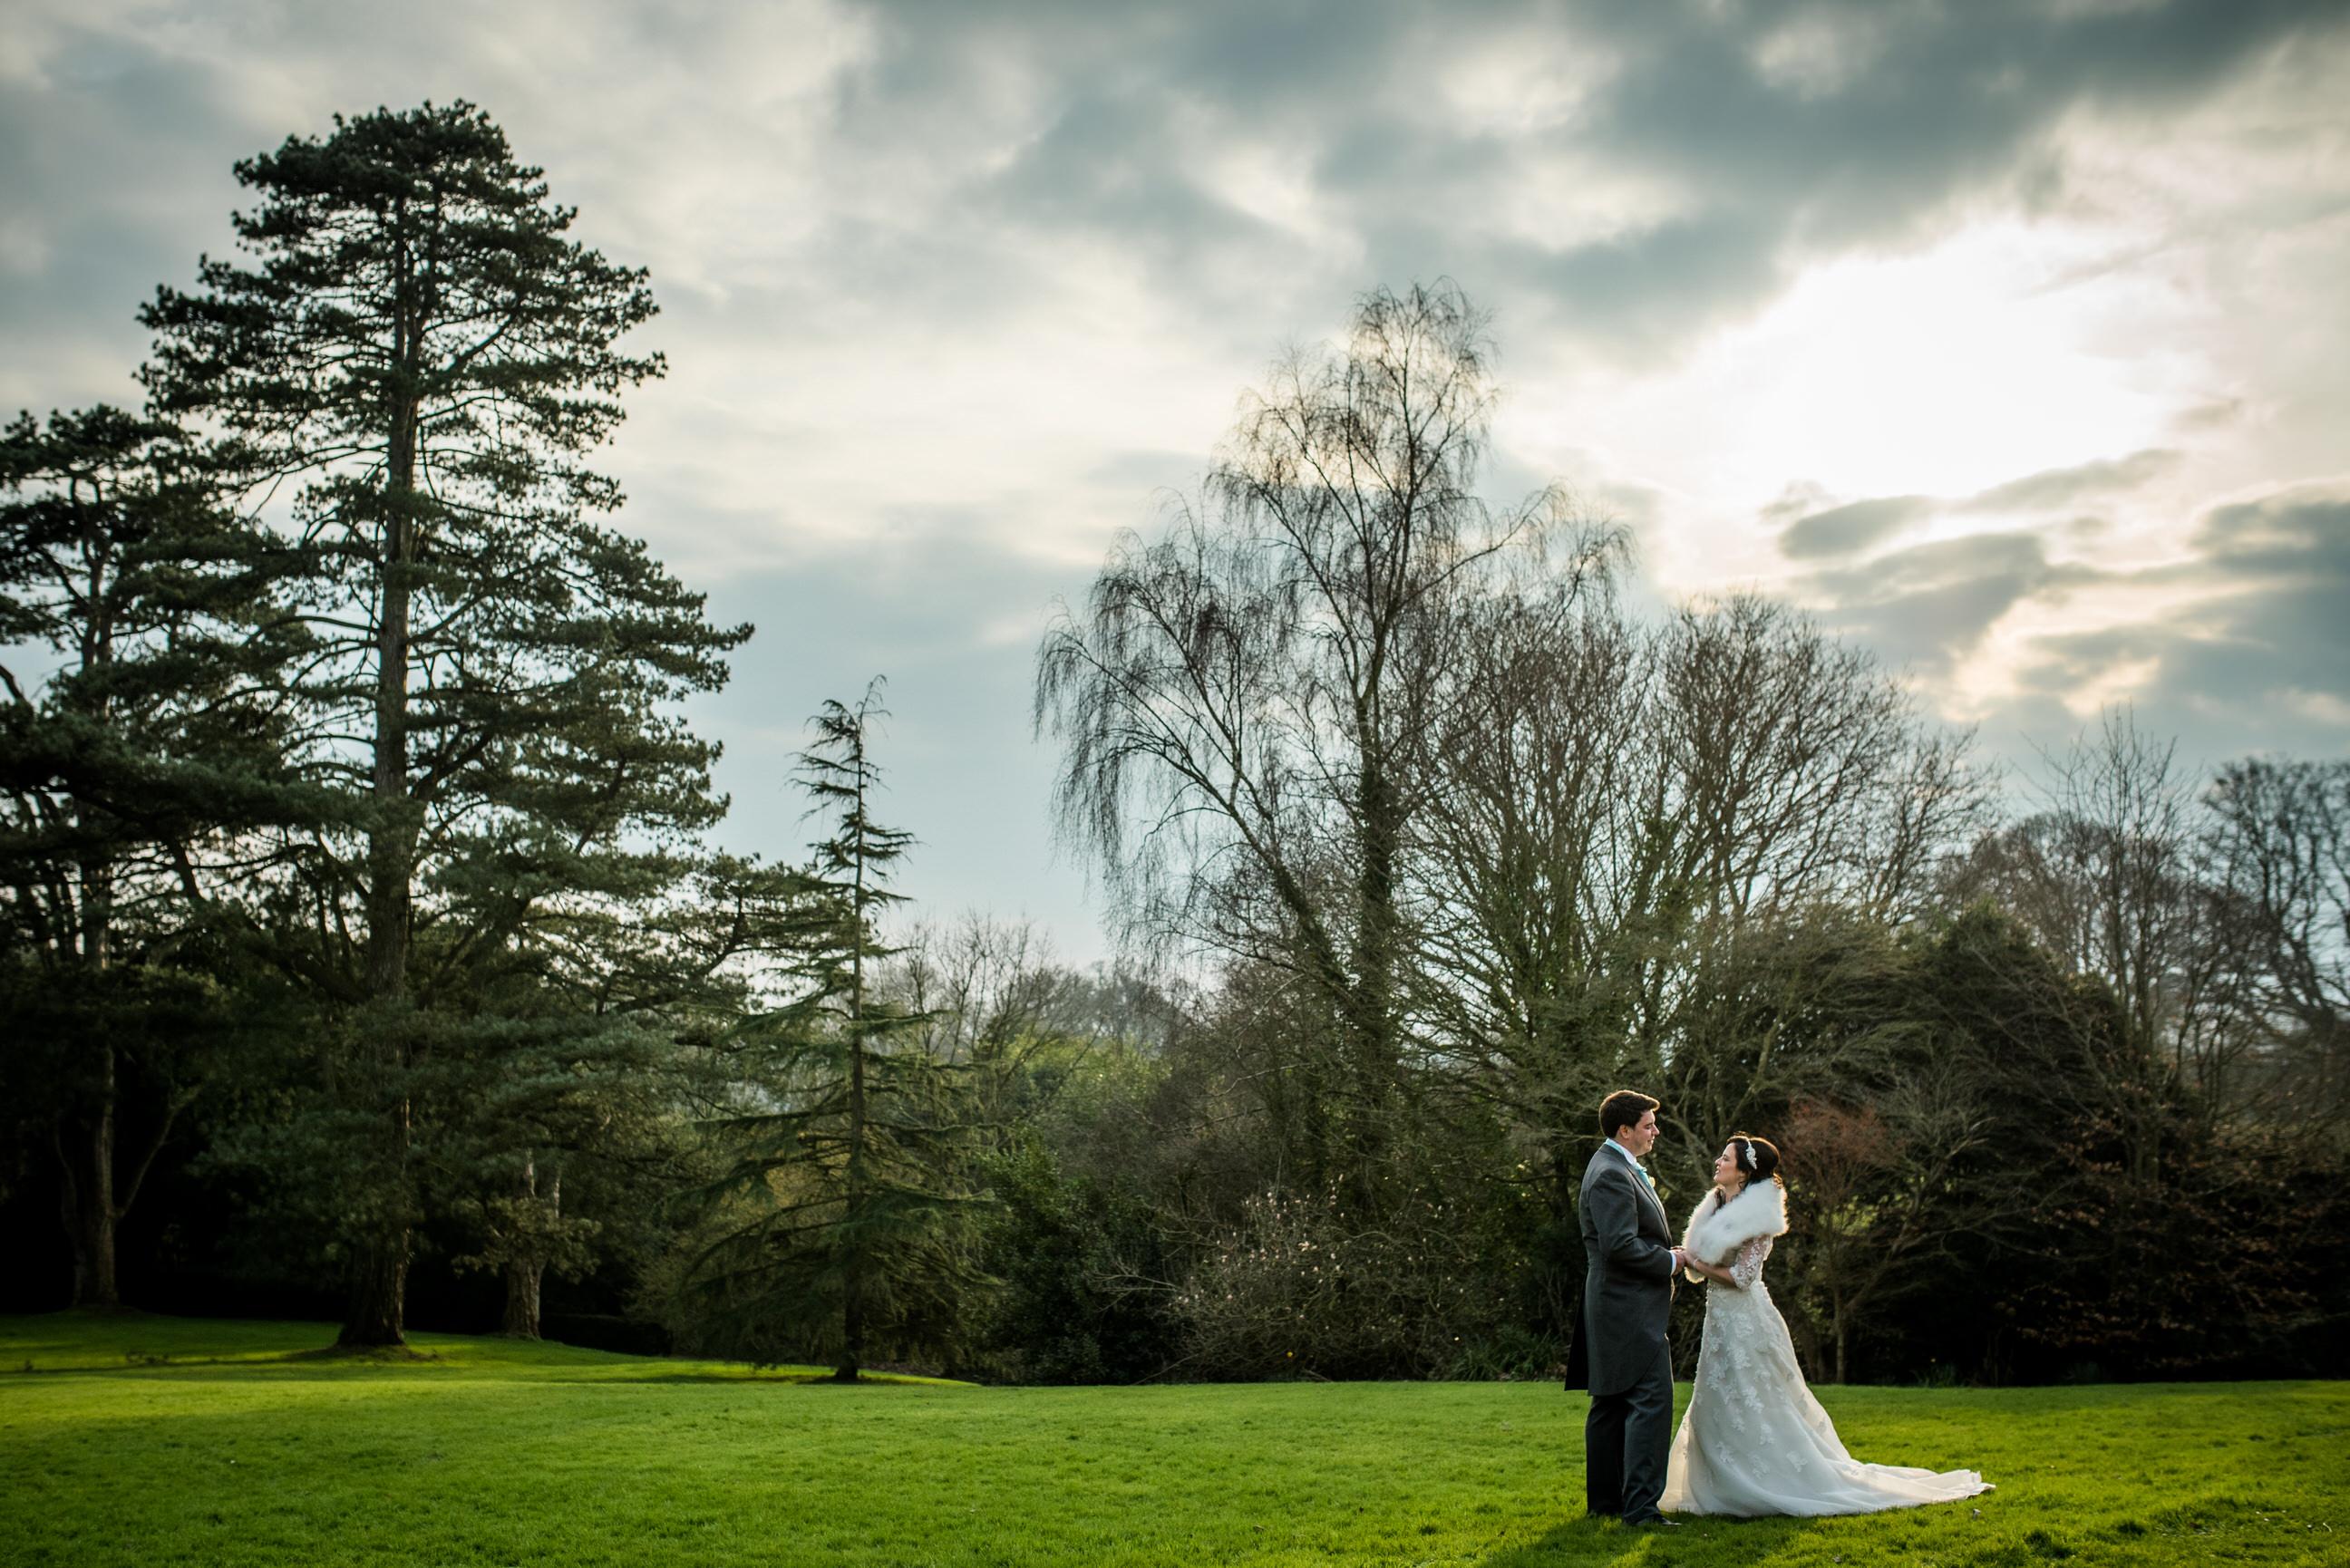 Winter wedding at Pennard House